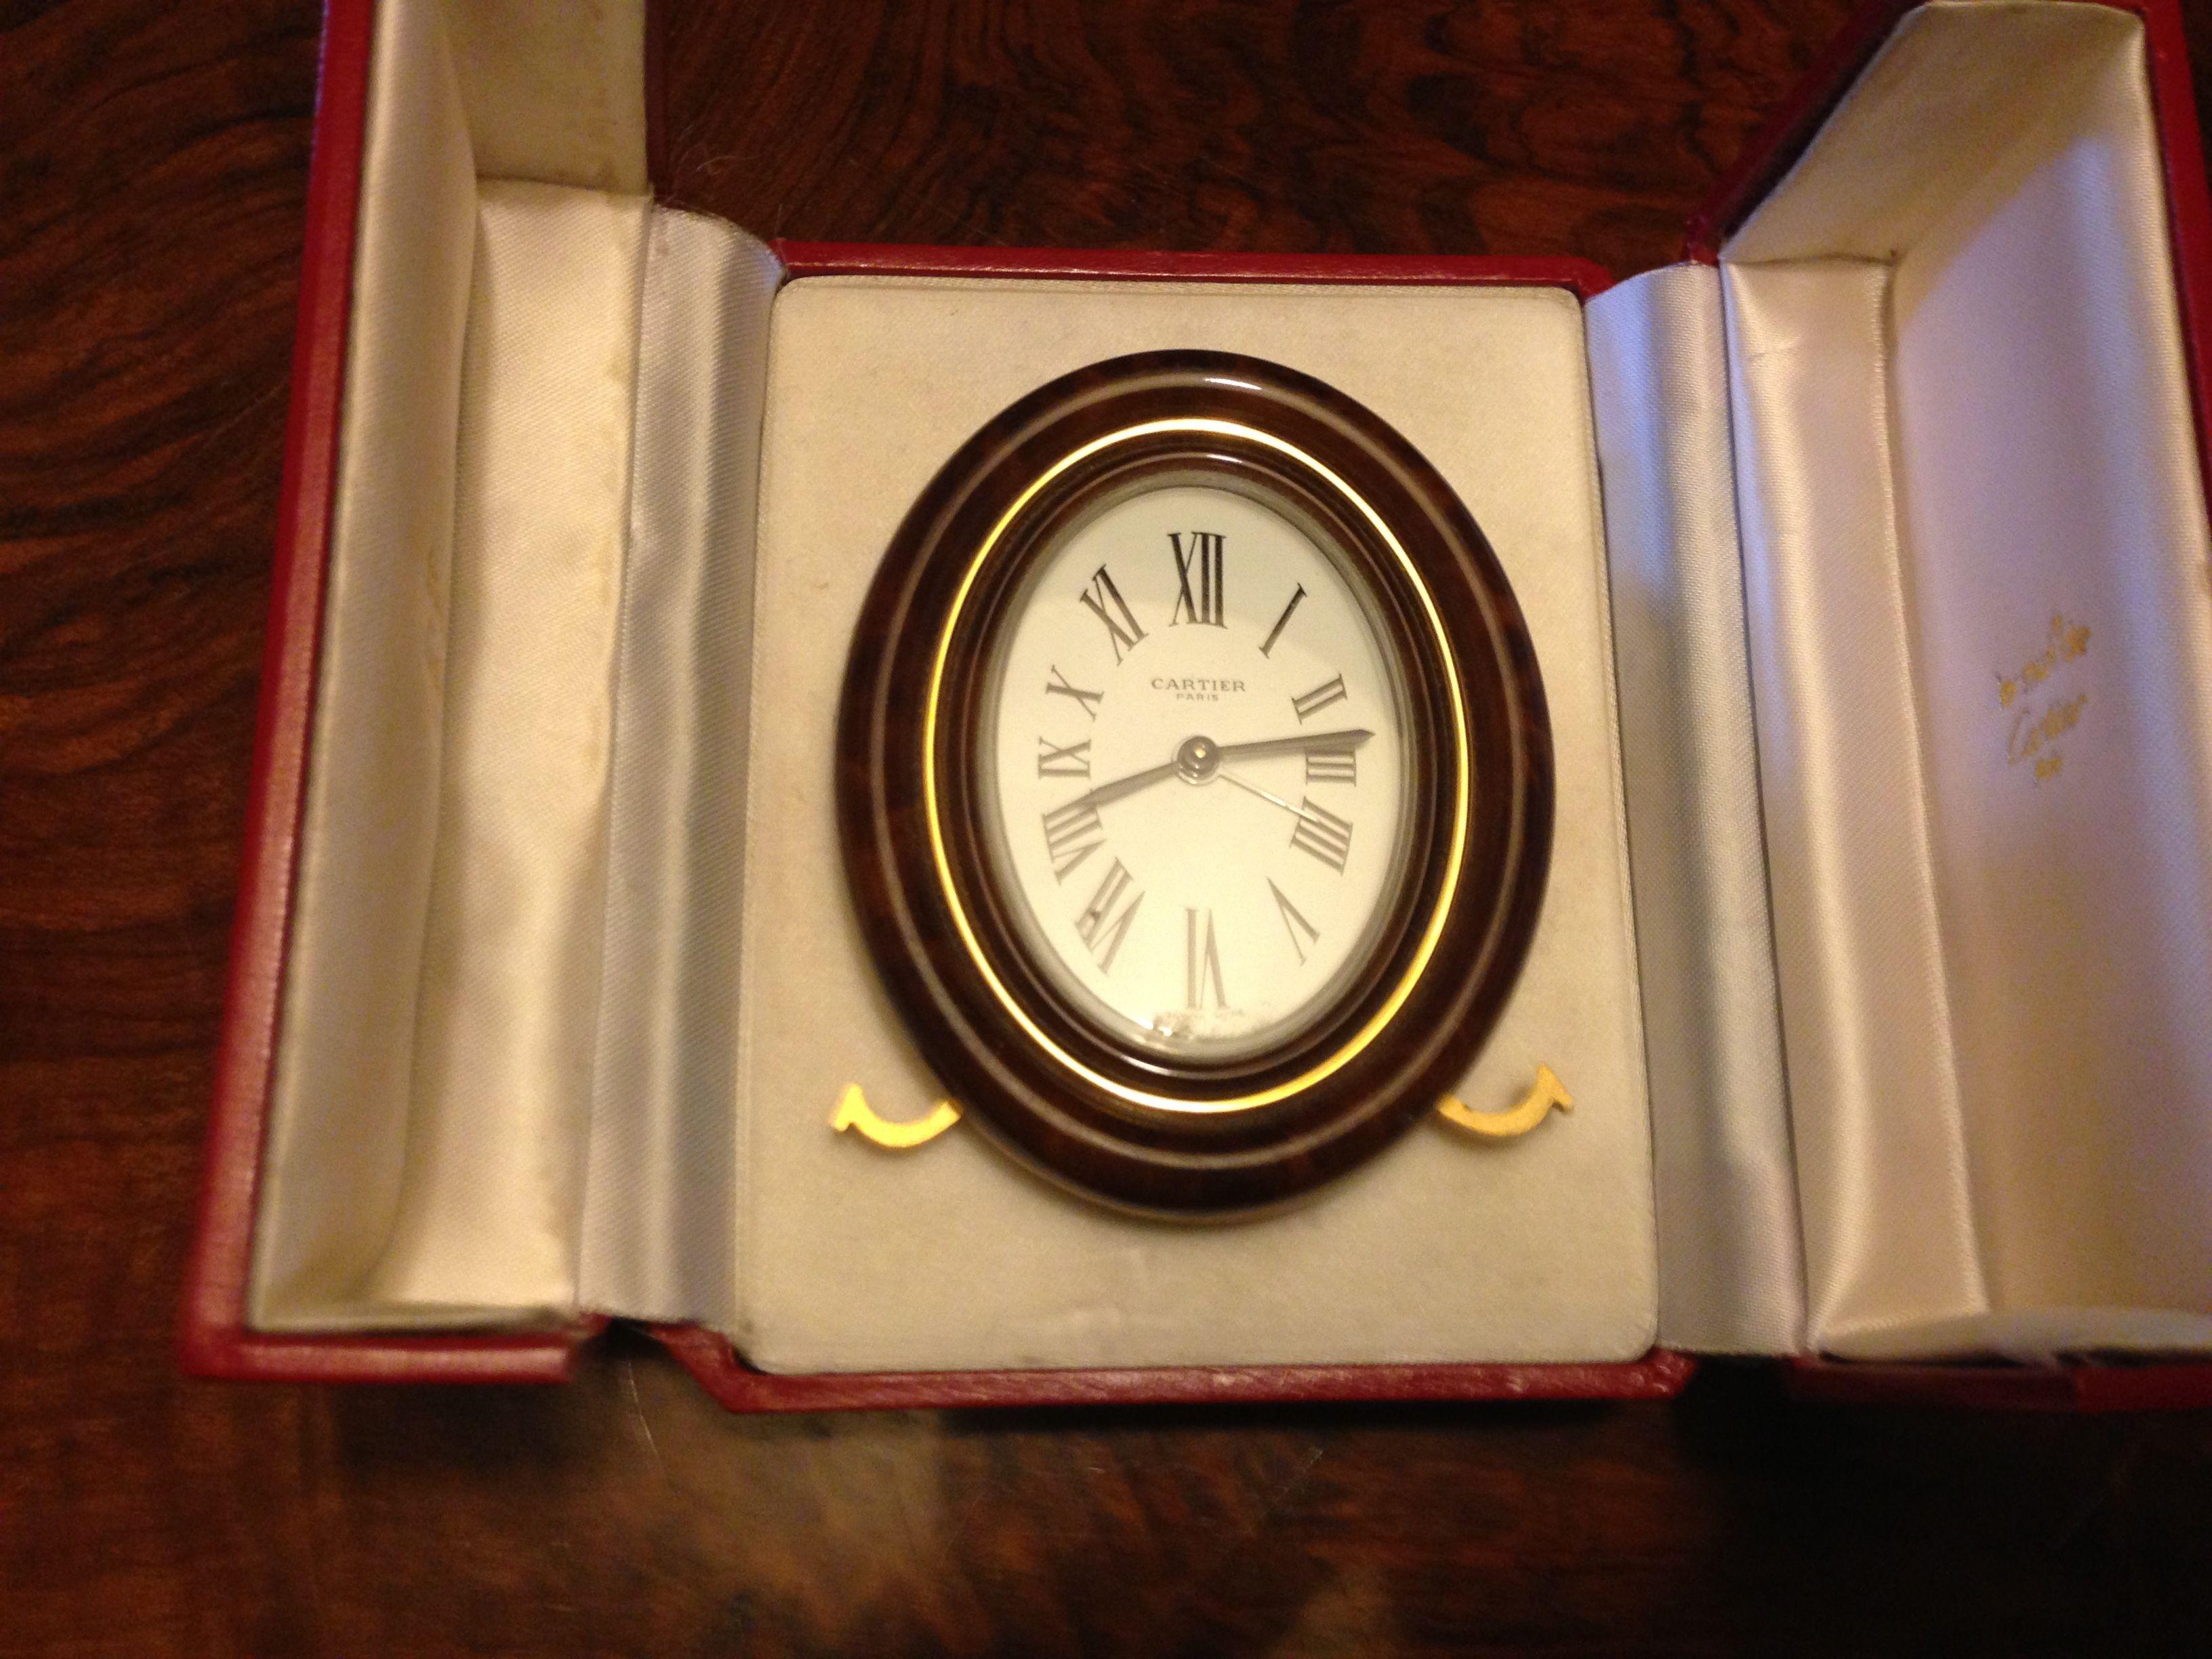 Cartier original desk clock 70s in original box rare and branded cartier original desk clock 70s in original box amipublicfo Images